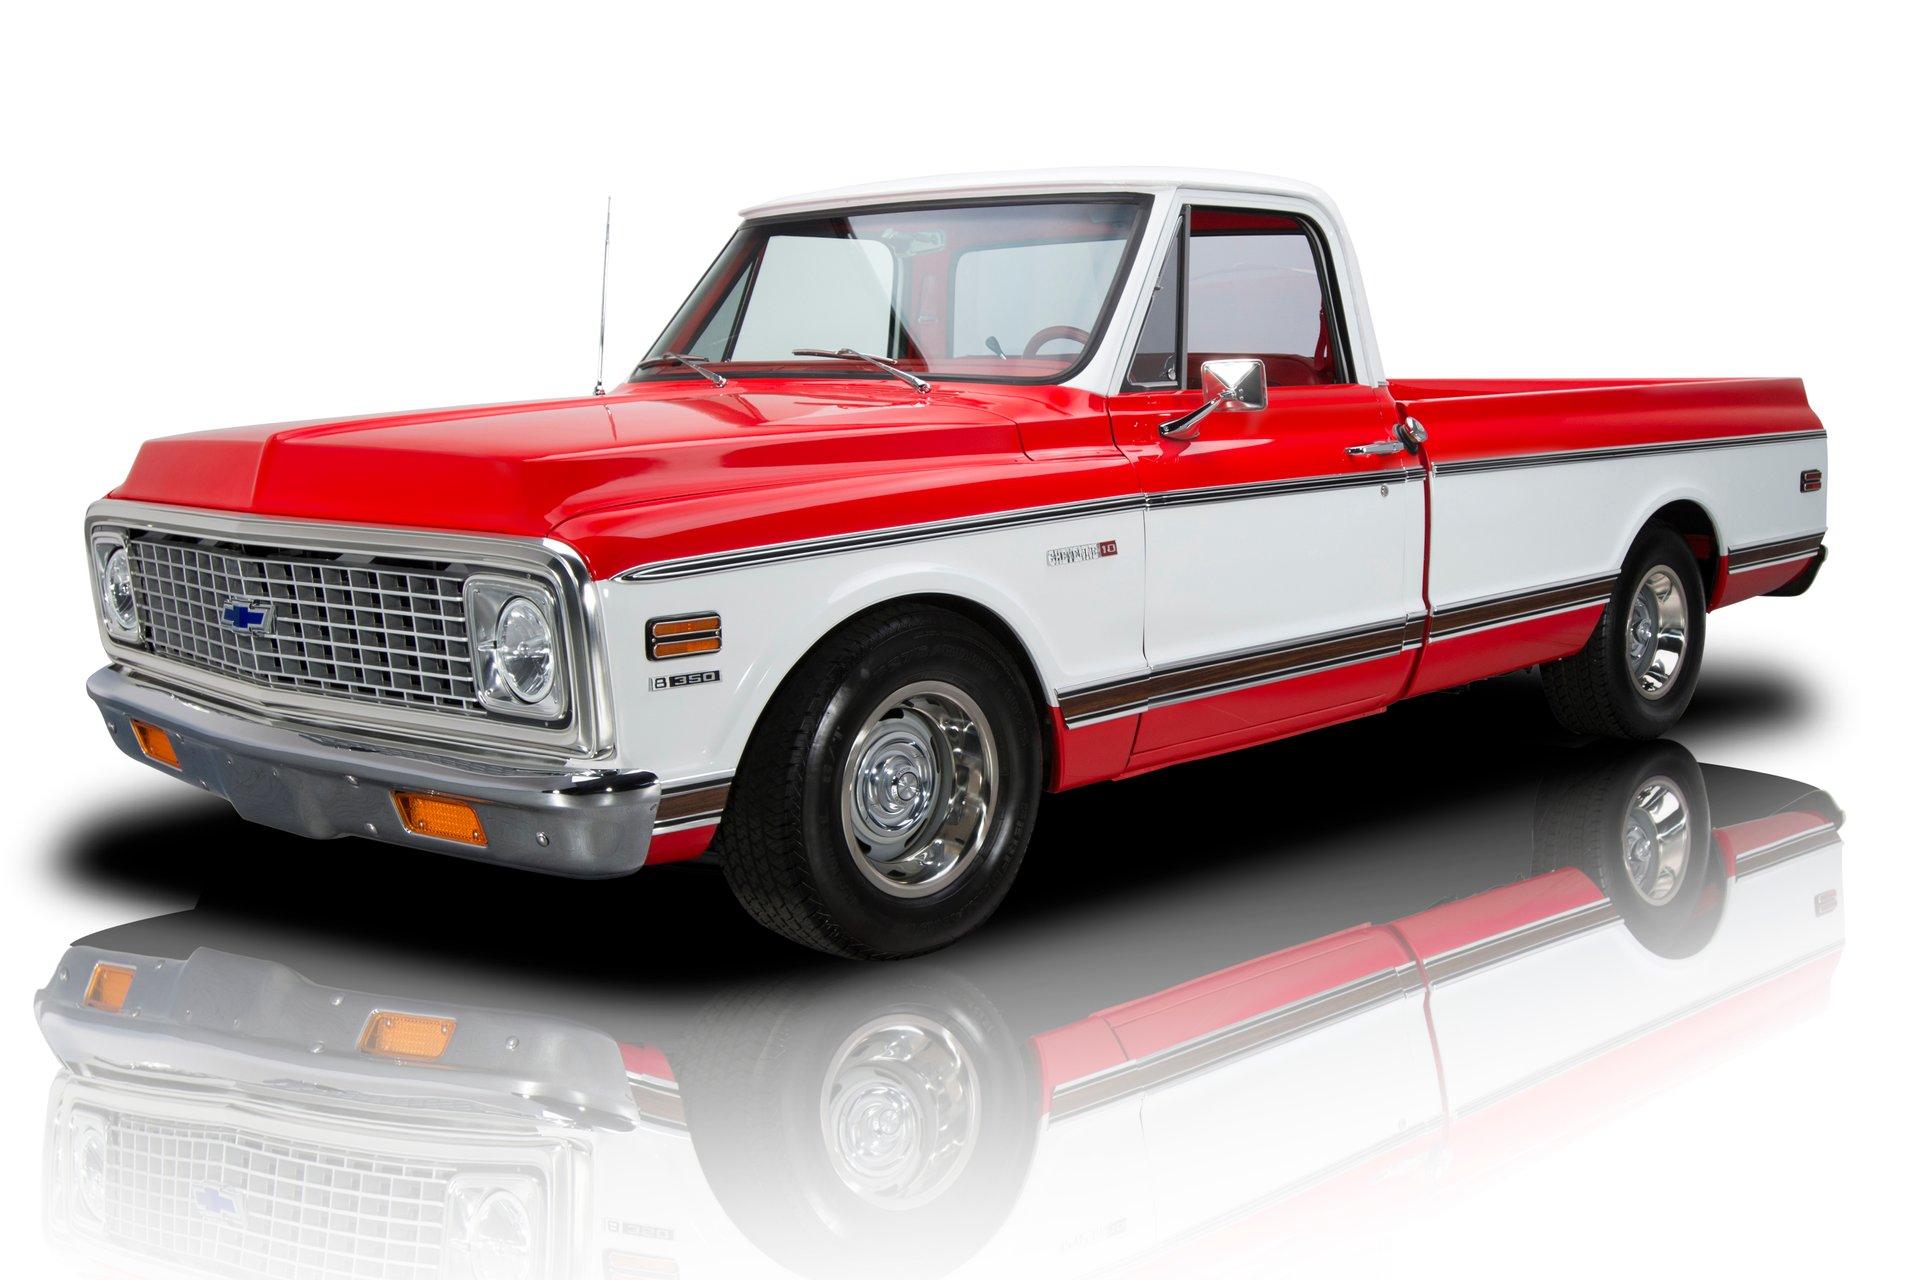 1972 chevrolet c10 cheyenne super pickup truck